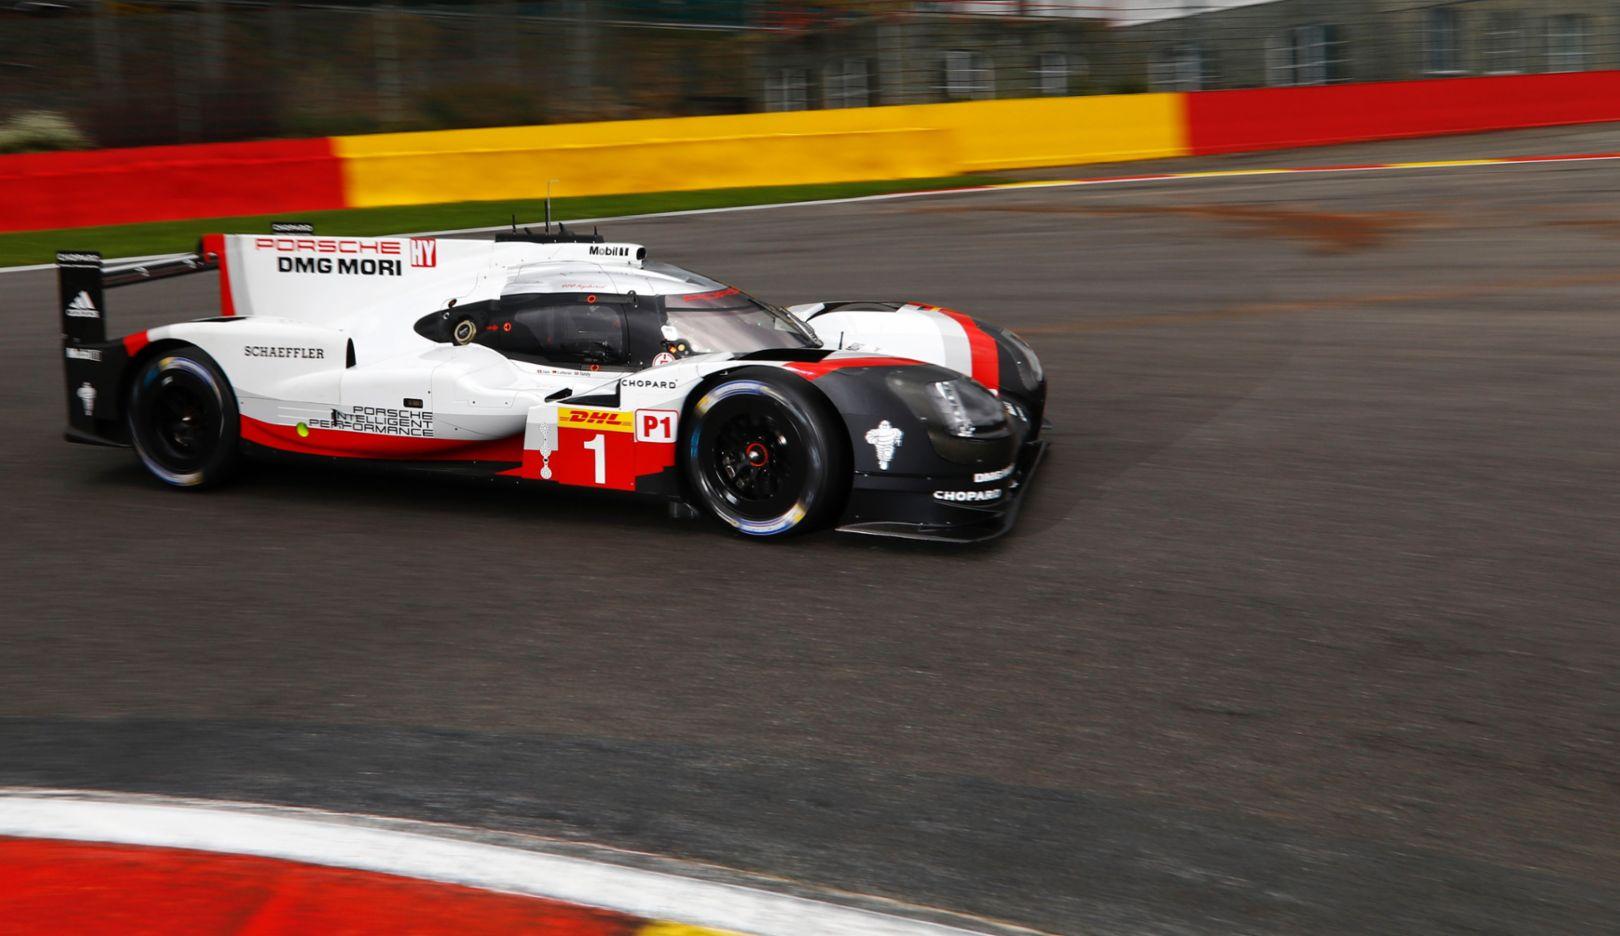 919 Hybrid, WEC, Training, Spa-Francorchamps, Belgien, 2017, Porsche AG